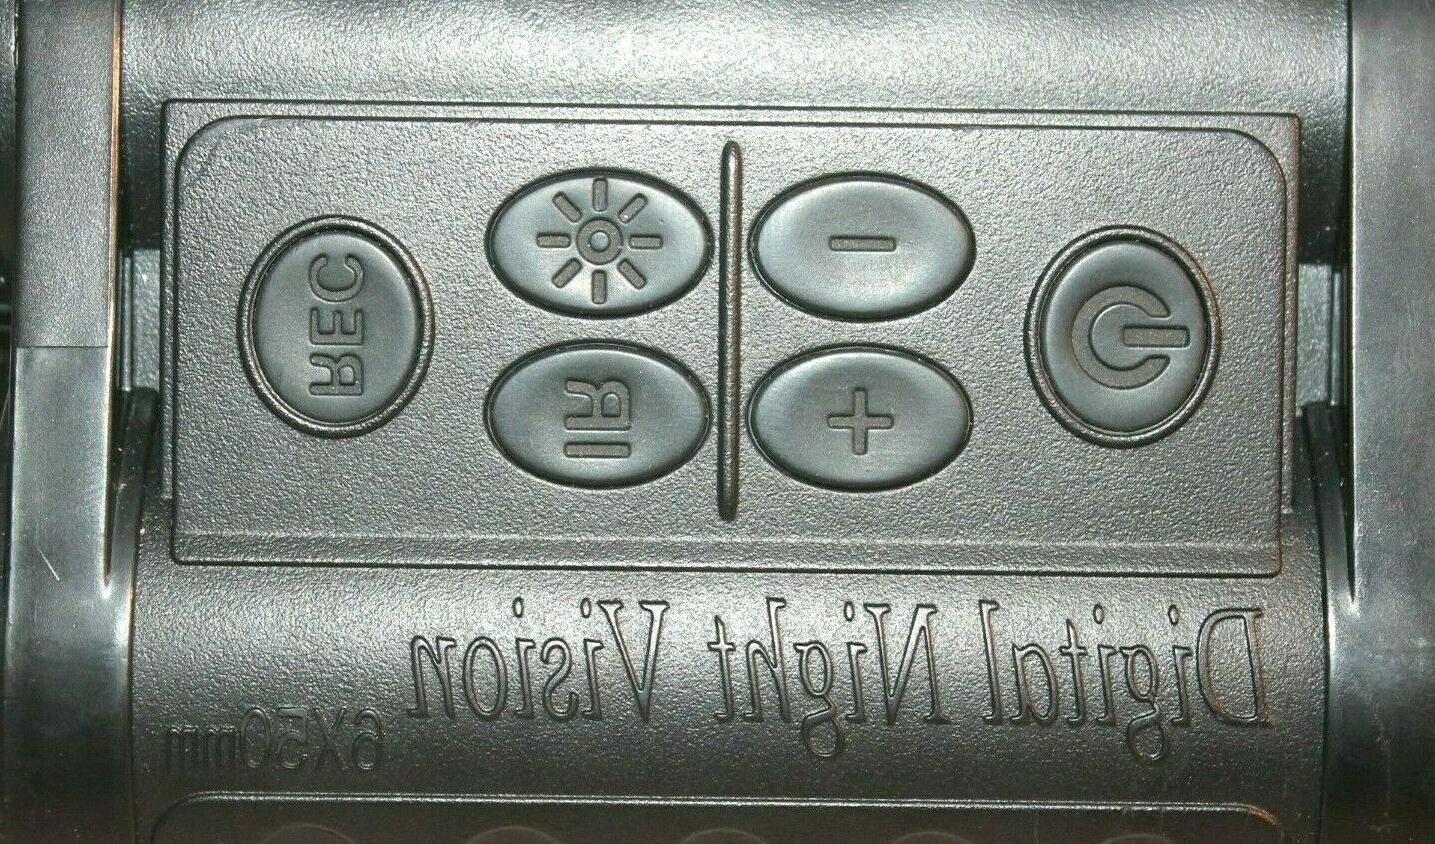 Bestguarder WG-50 WiFi Digital Infrared Monocular